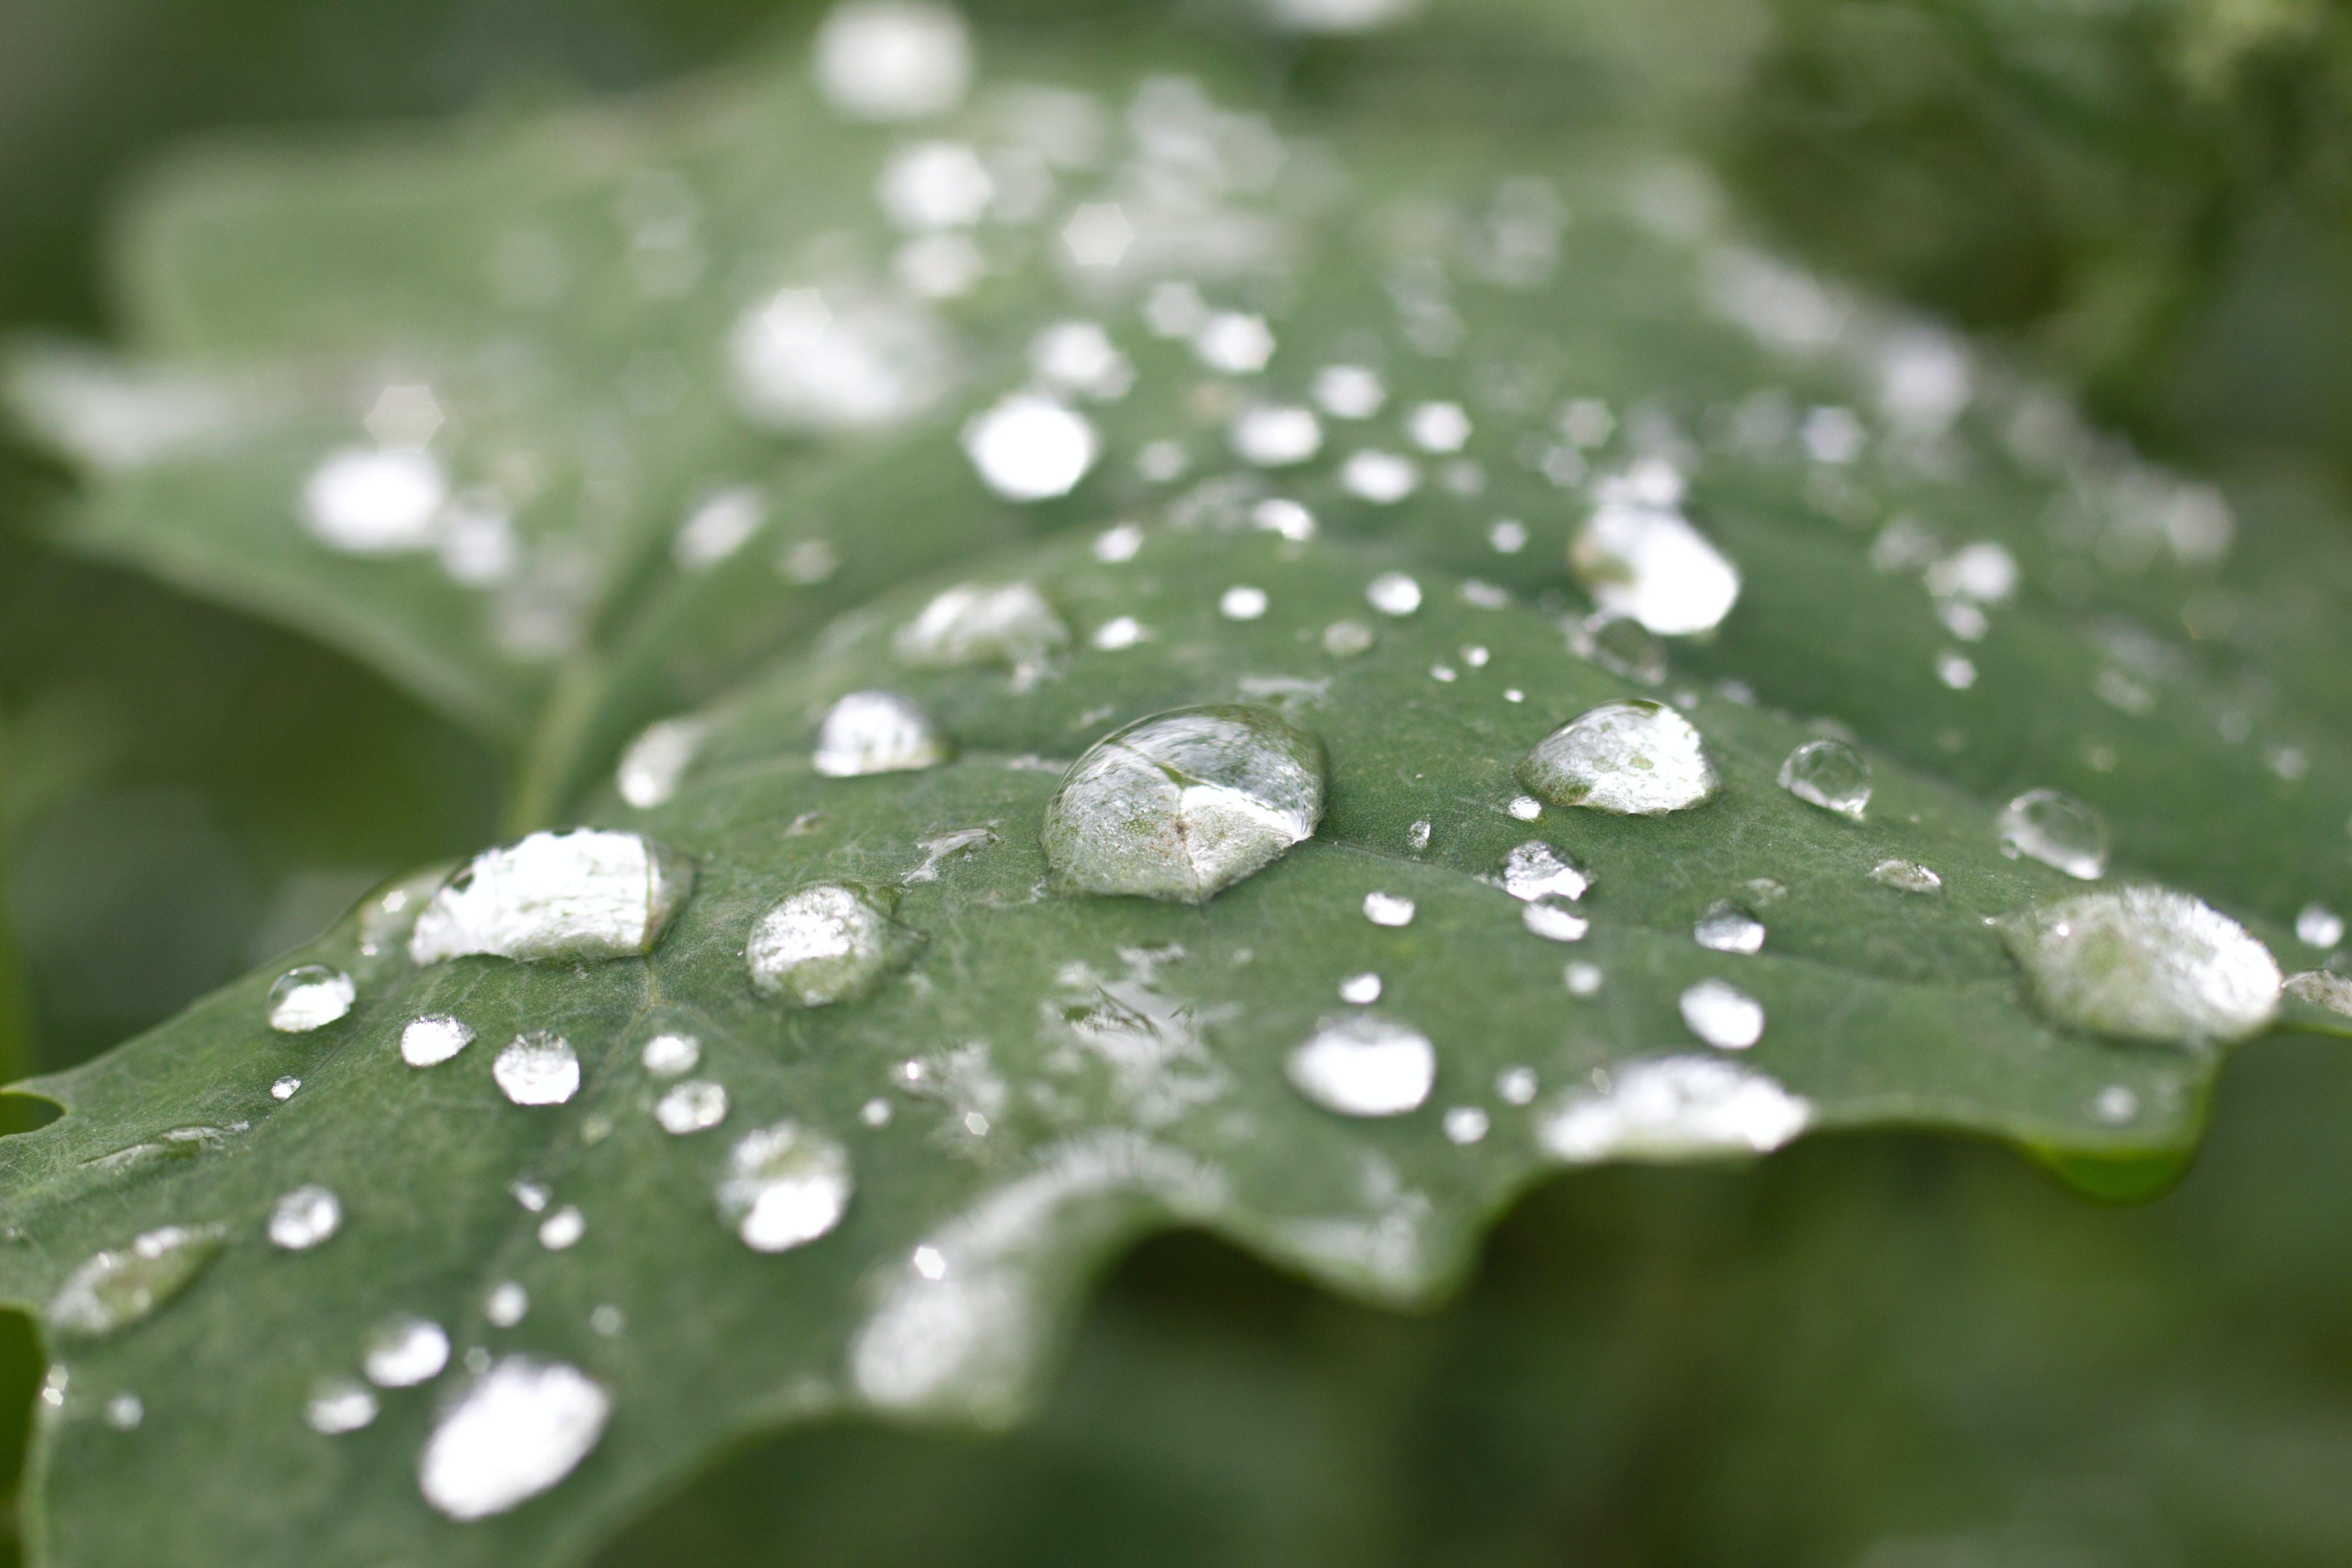 close-up, dew, leaf